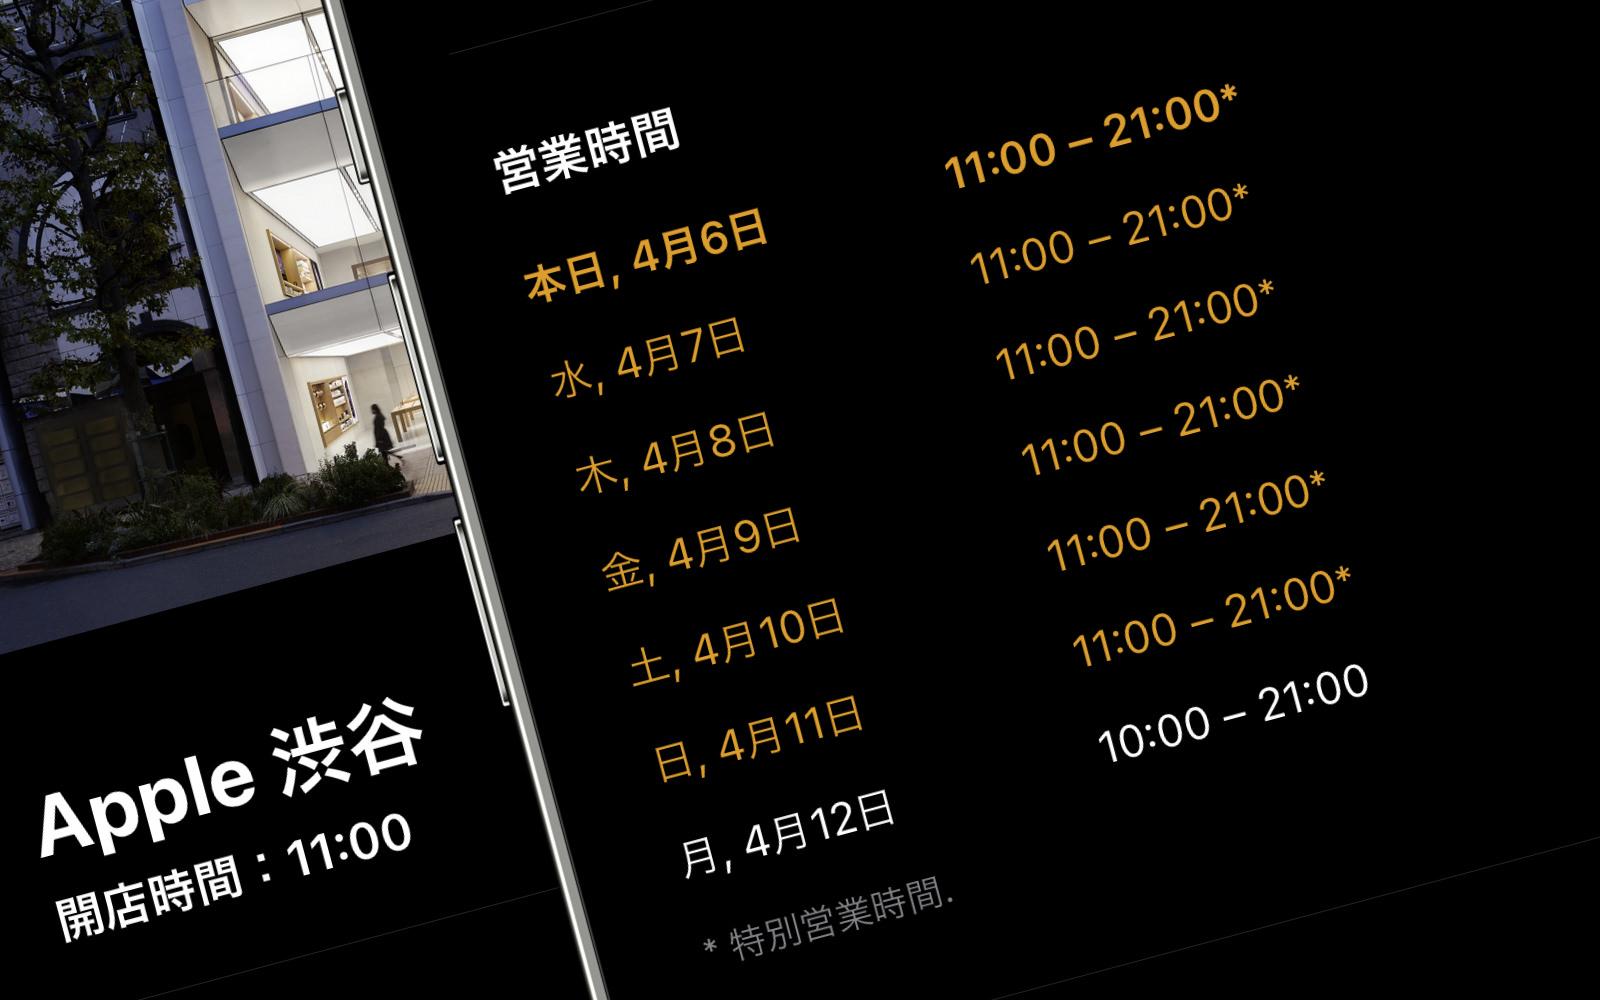 Apple Shibuya Service hours